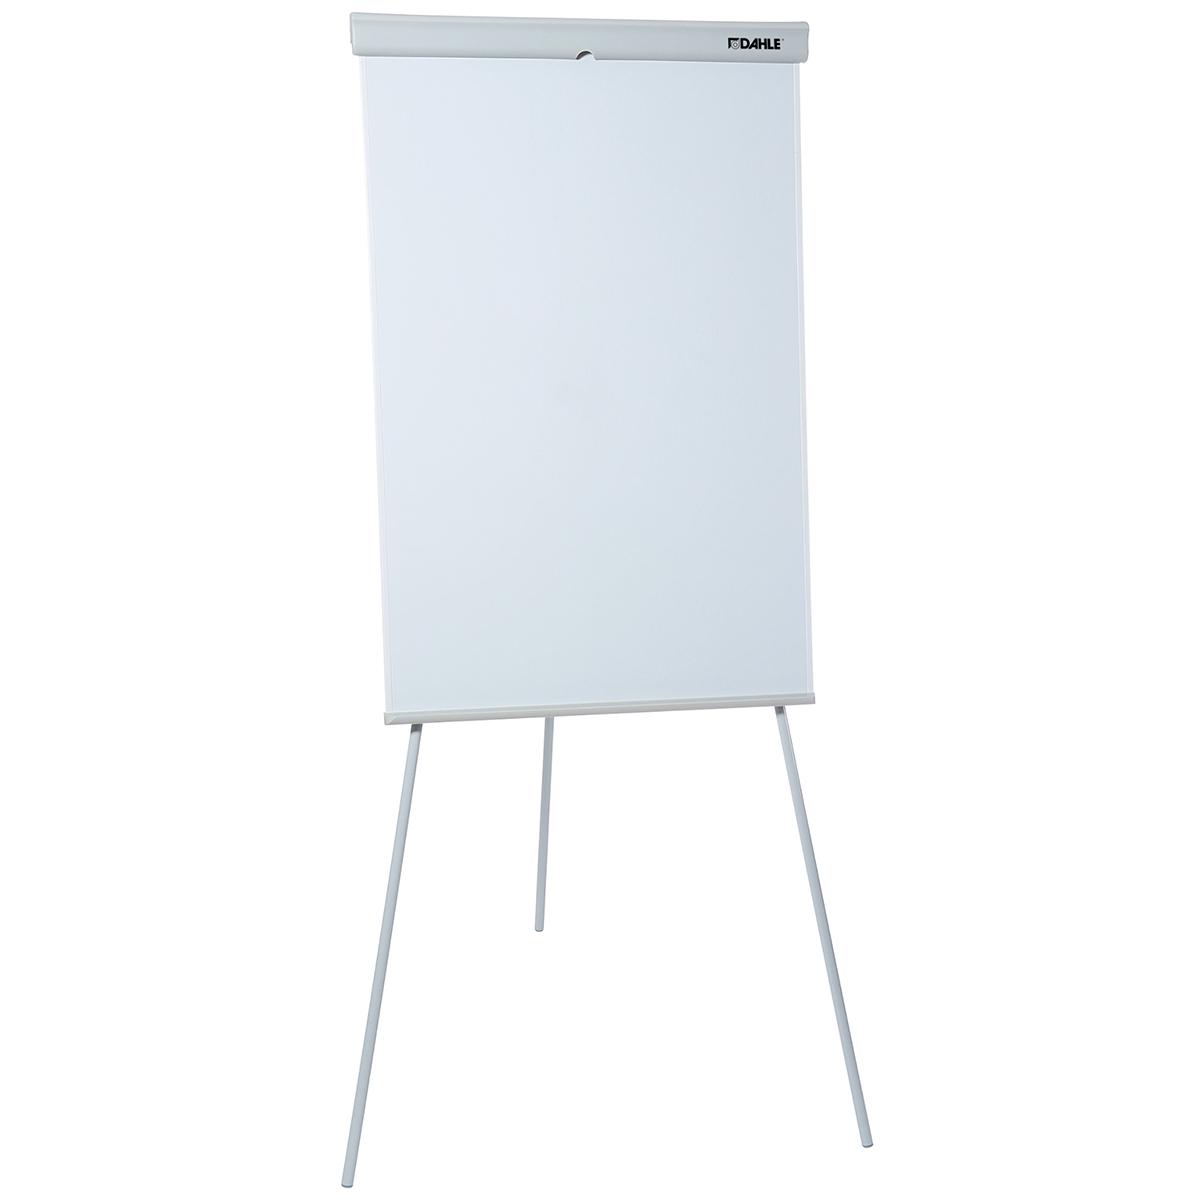 Dahle Personal Flip Chart Easel 68x105cm